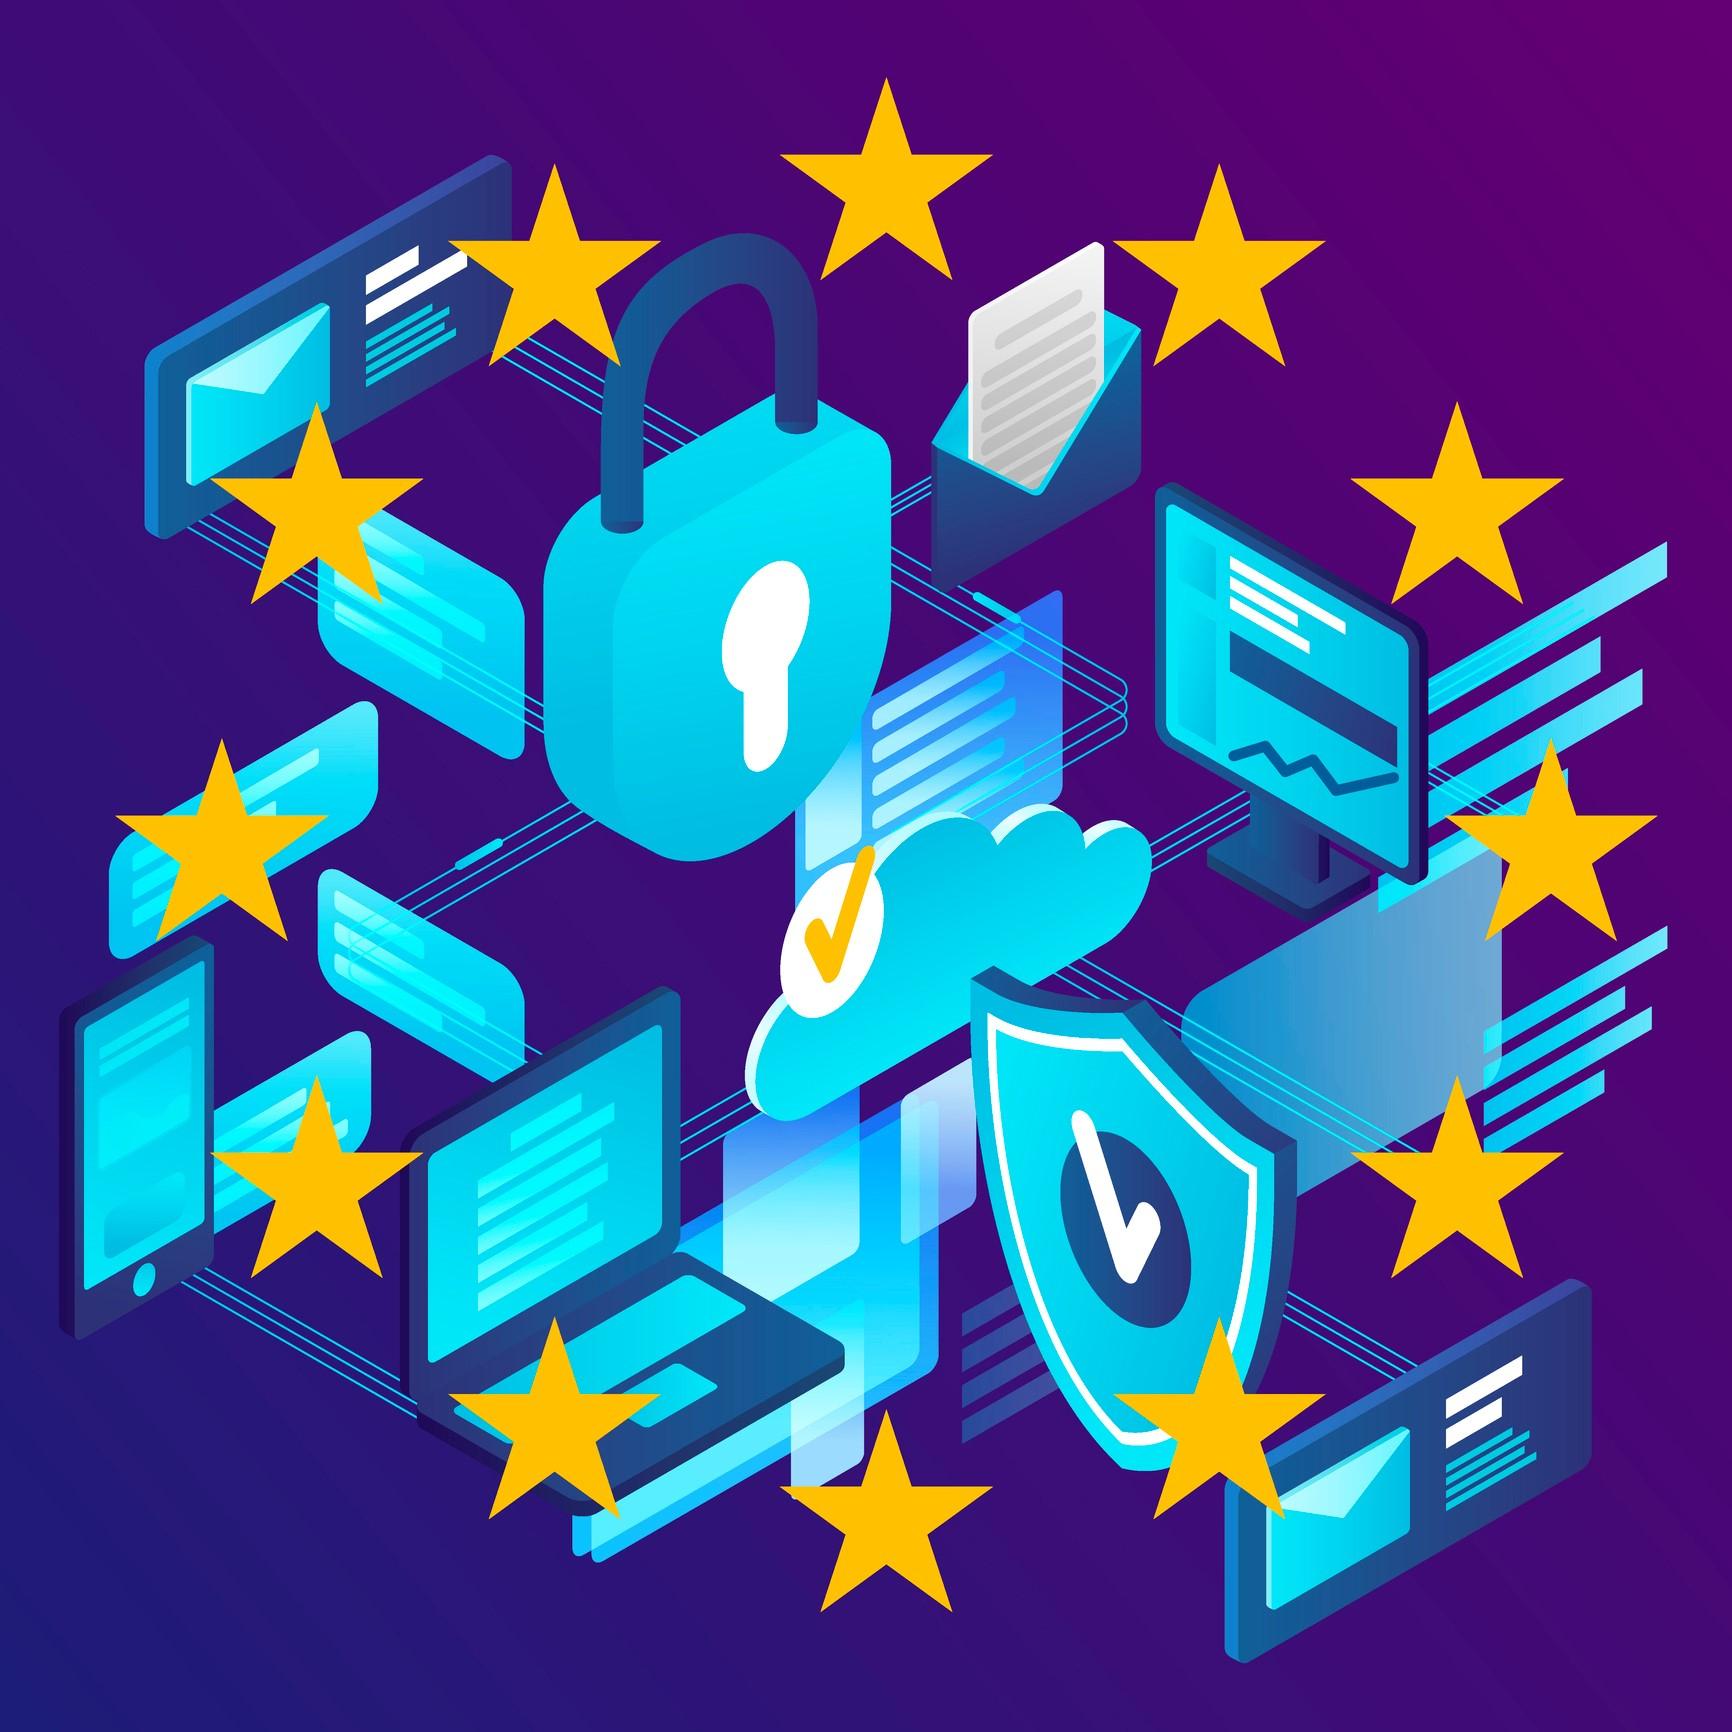 https://webservices.wkf.fr/editorial/medias/images/actu-86956-digital-services-act.jpg